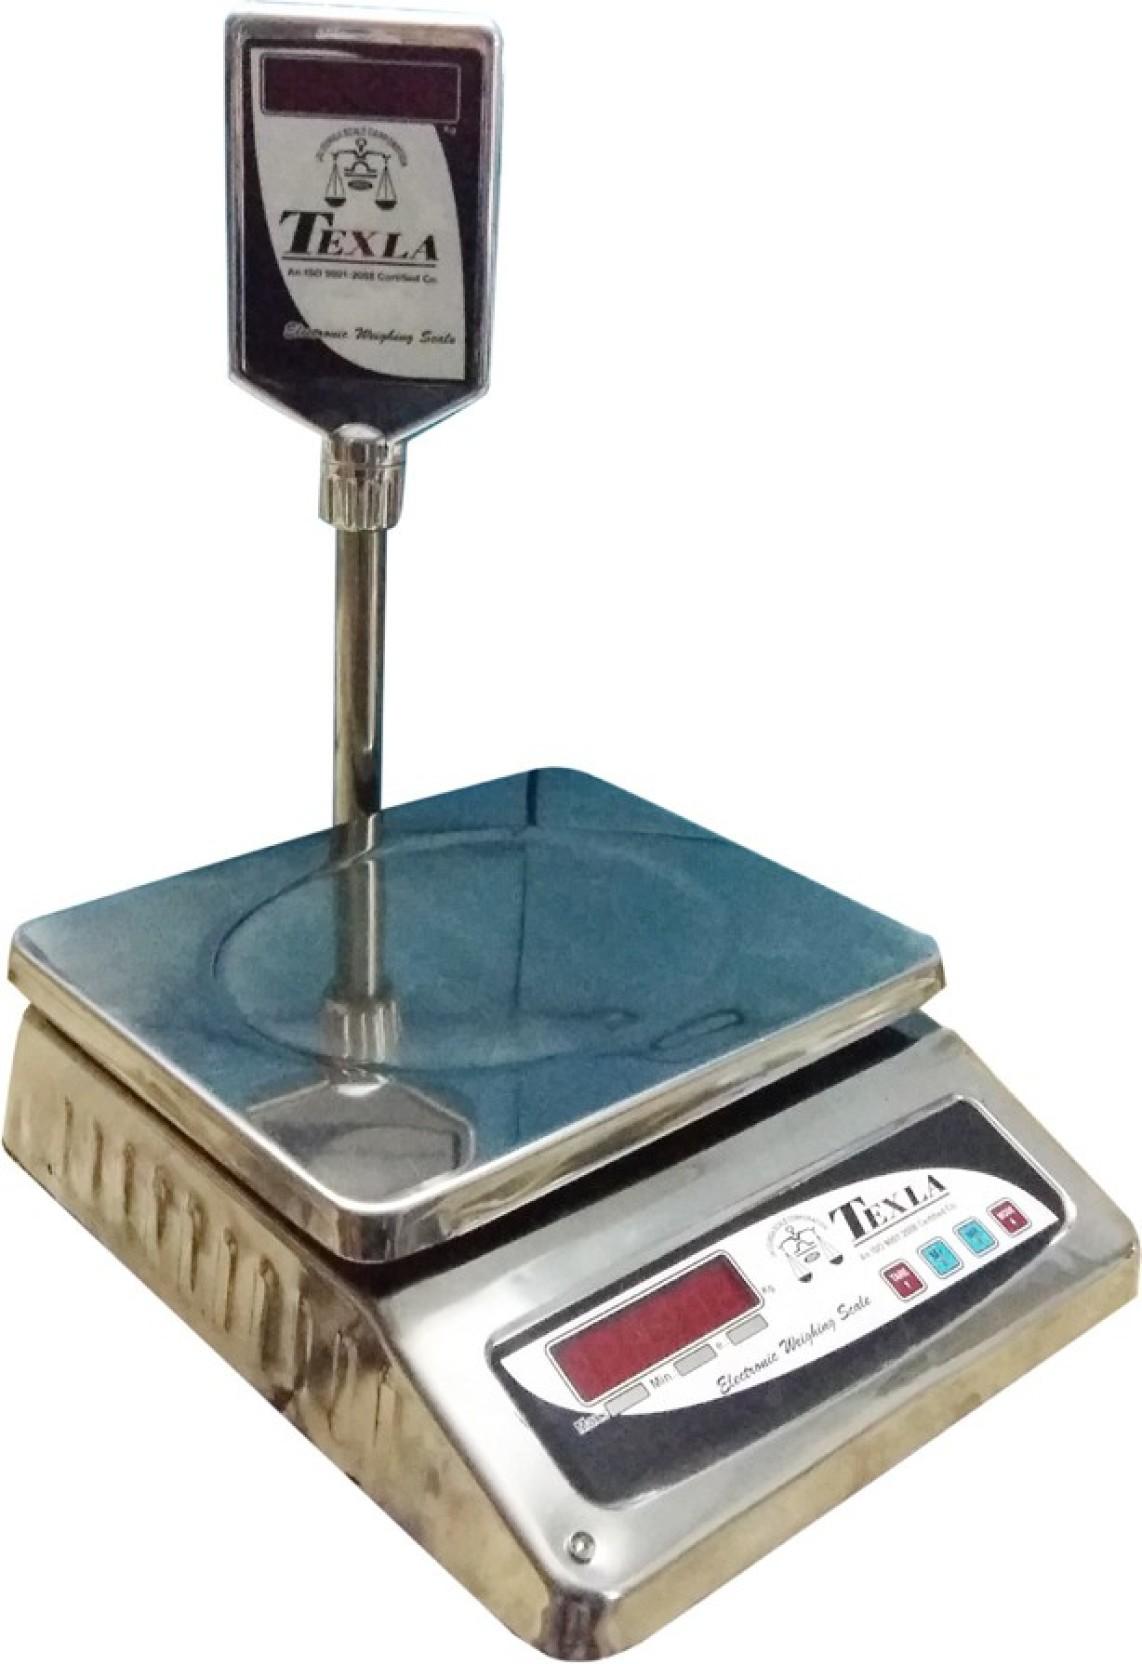 TEXLA jdt30 Weighing Scale Price in India - Buy TEXLA jdt30 Weighing ...